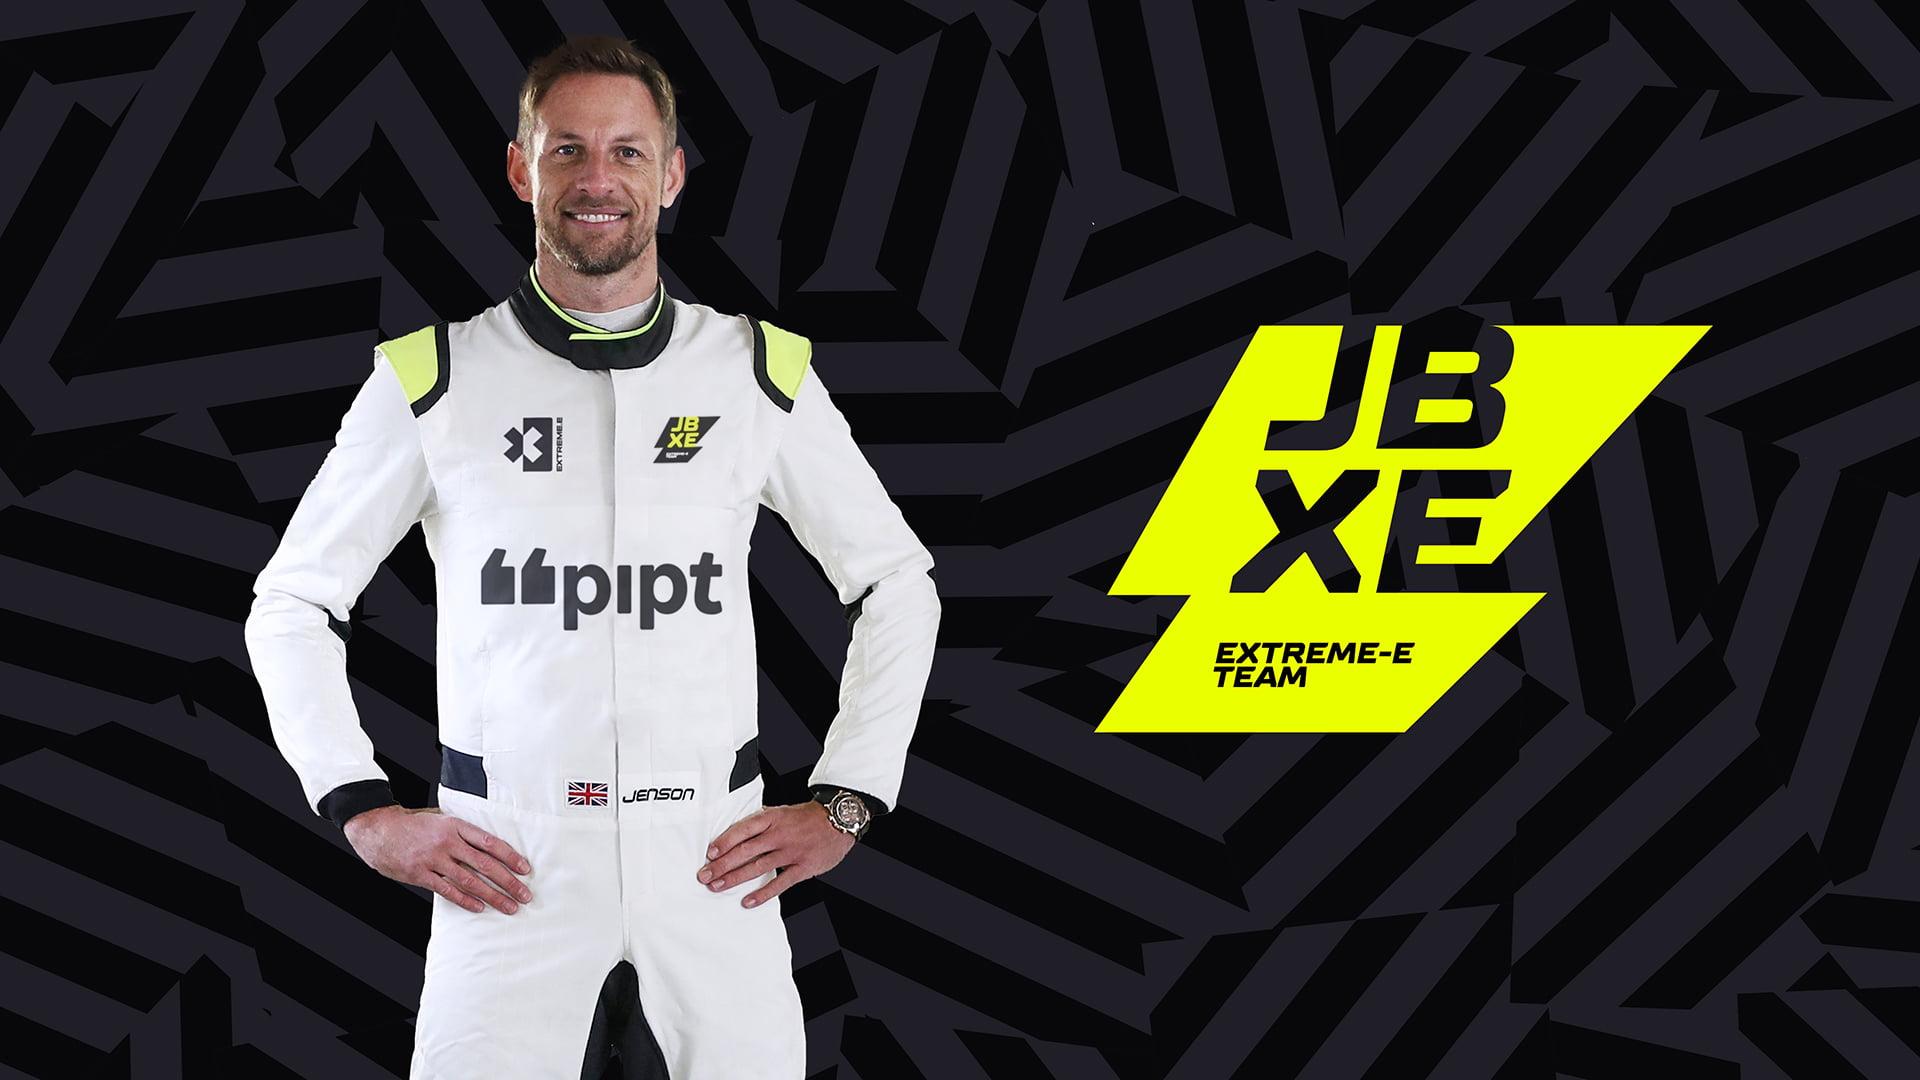 Jenson Button competirá en el campeonato Extreme E 2021